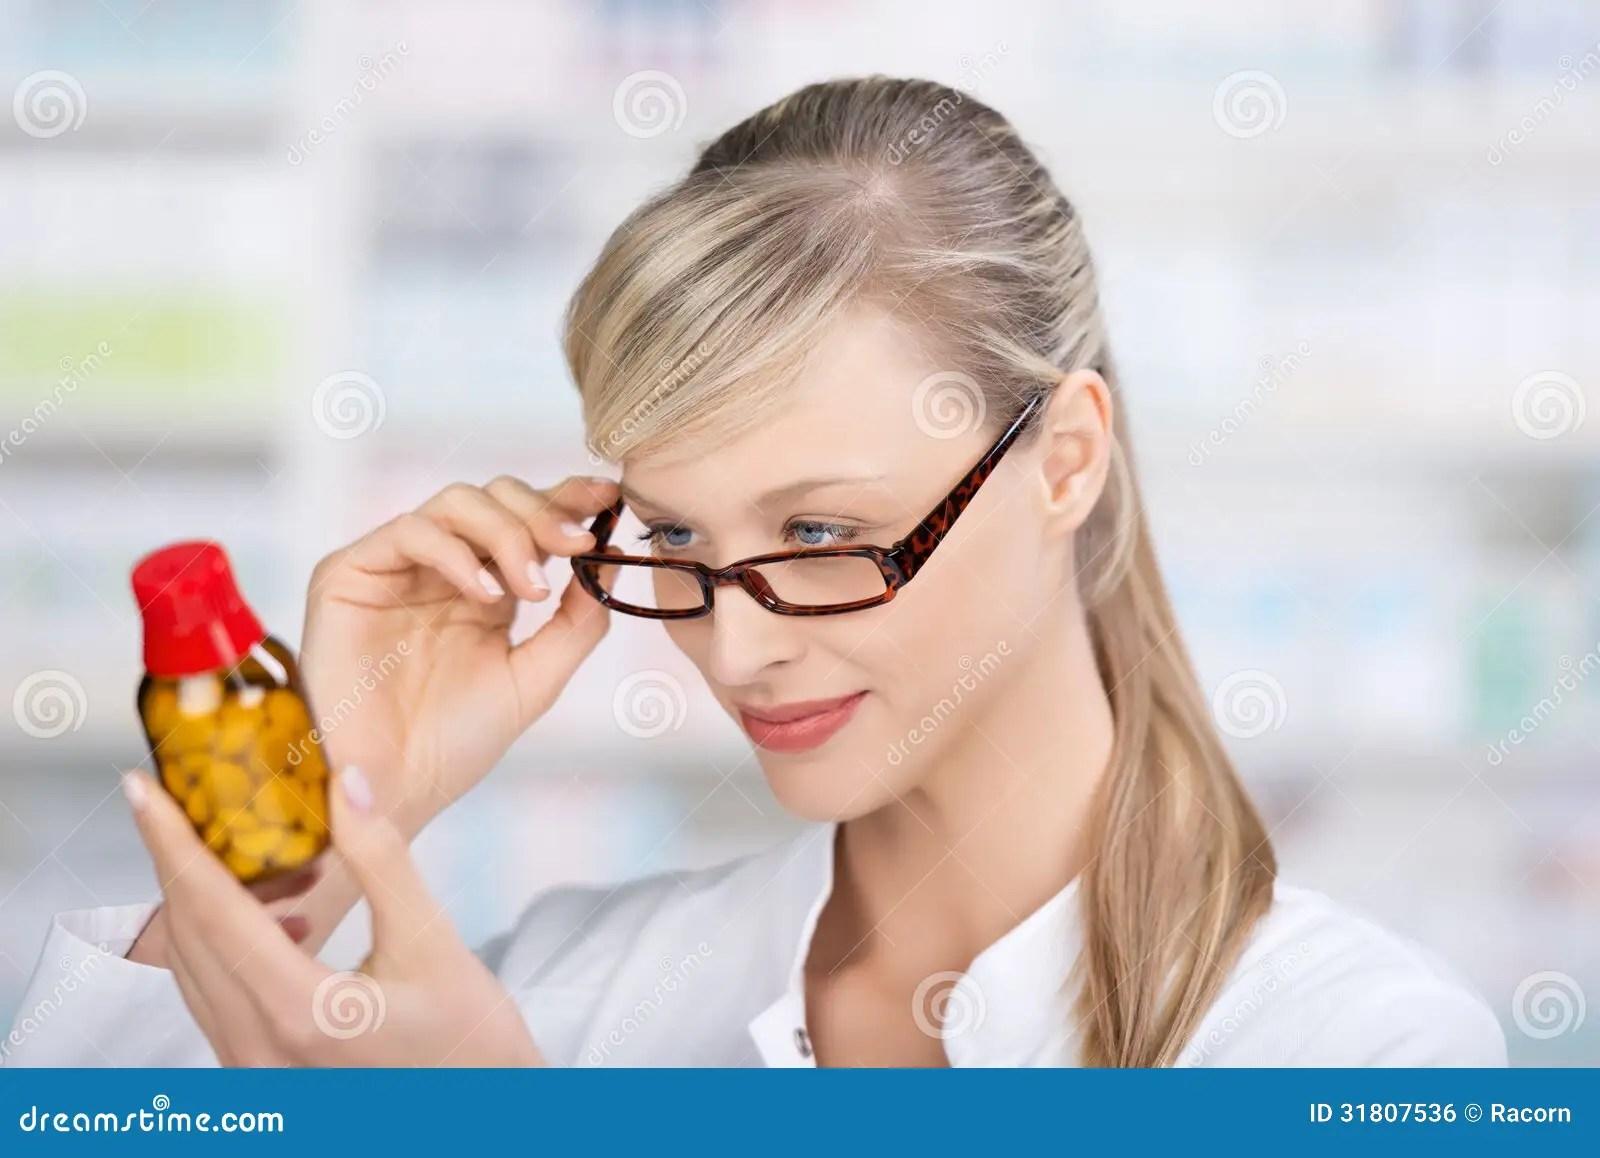 Female Pharmacist Reading The Medicine Label Stock Photo